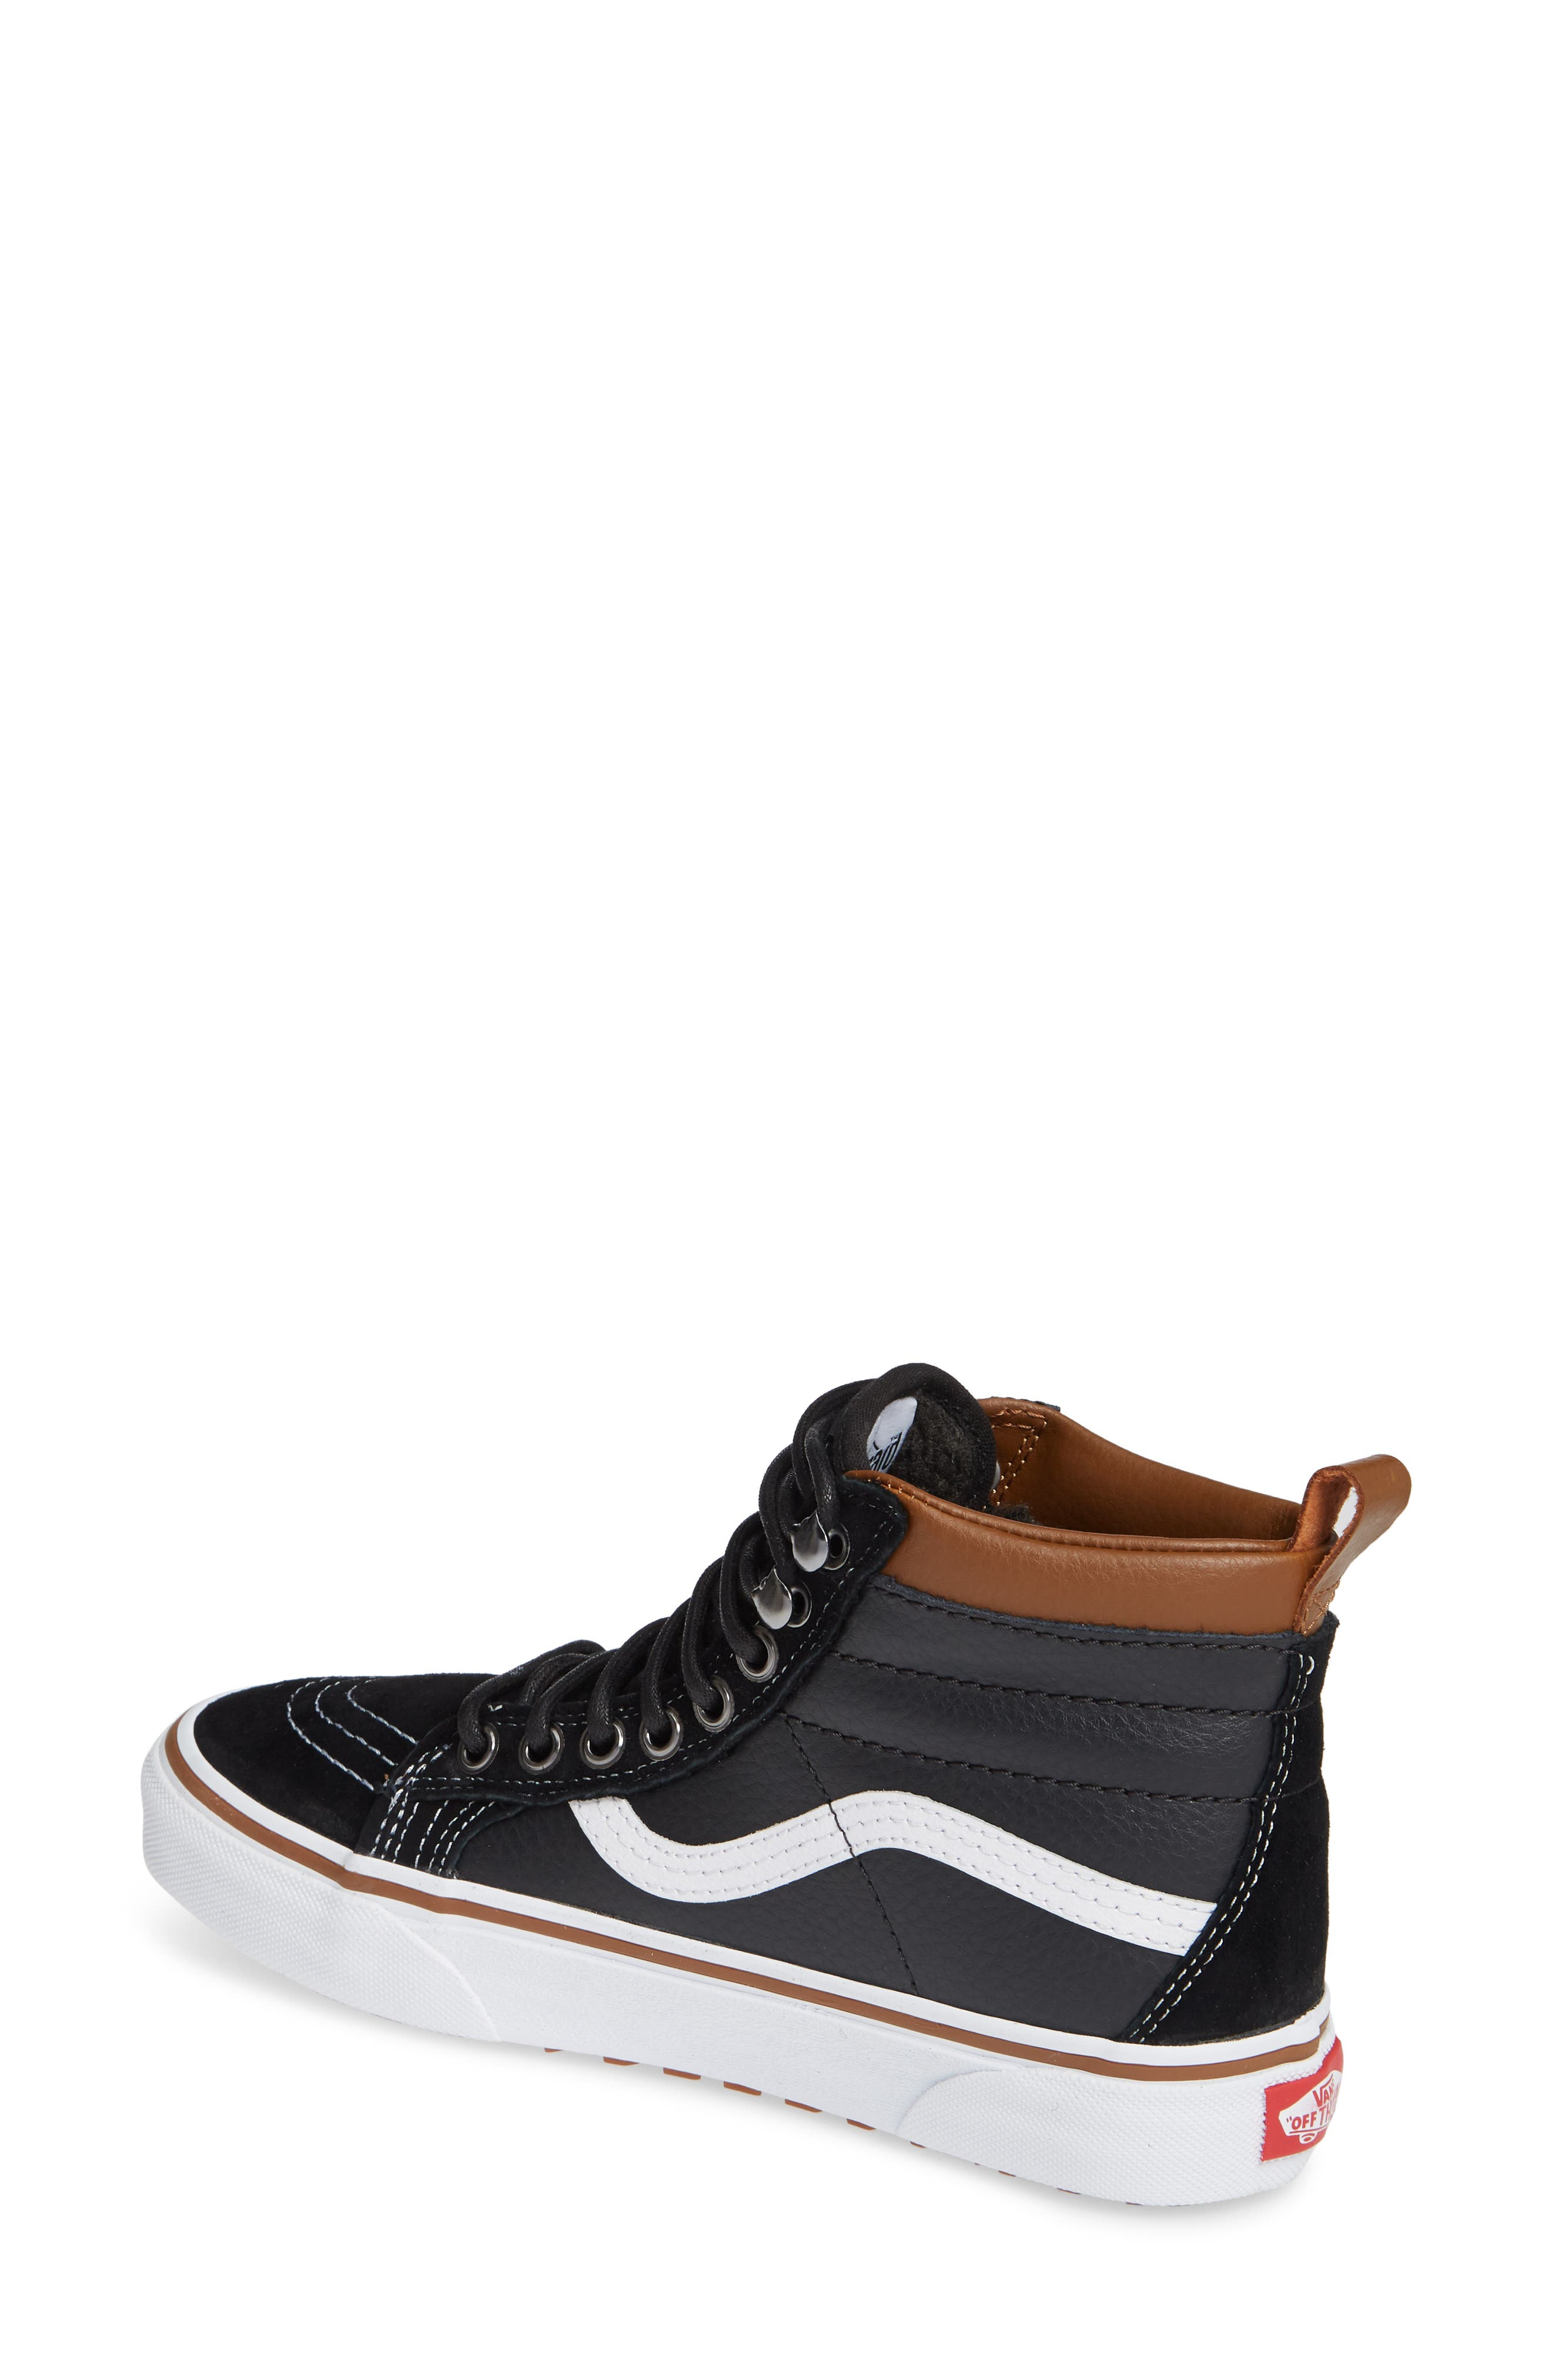 Sk-8 Hi MTE Sneaker,                             Alternate thumbnail 2, color,                             LEATHER/ BLACK/ TRUE WHITE